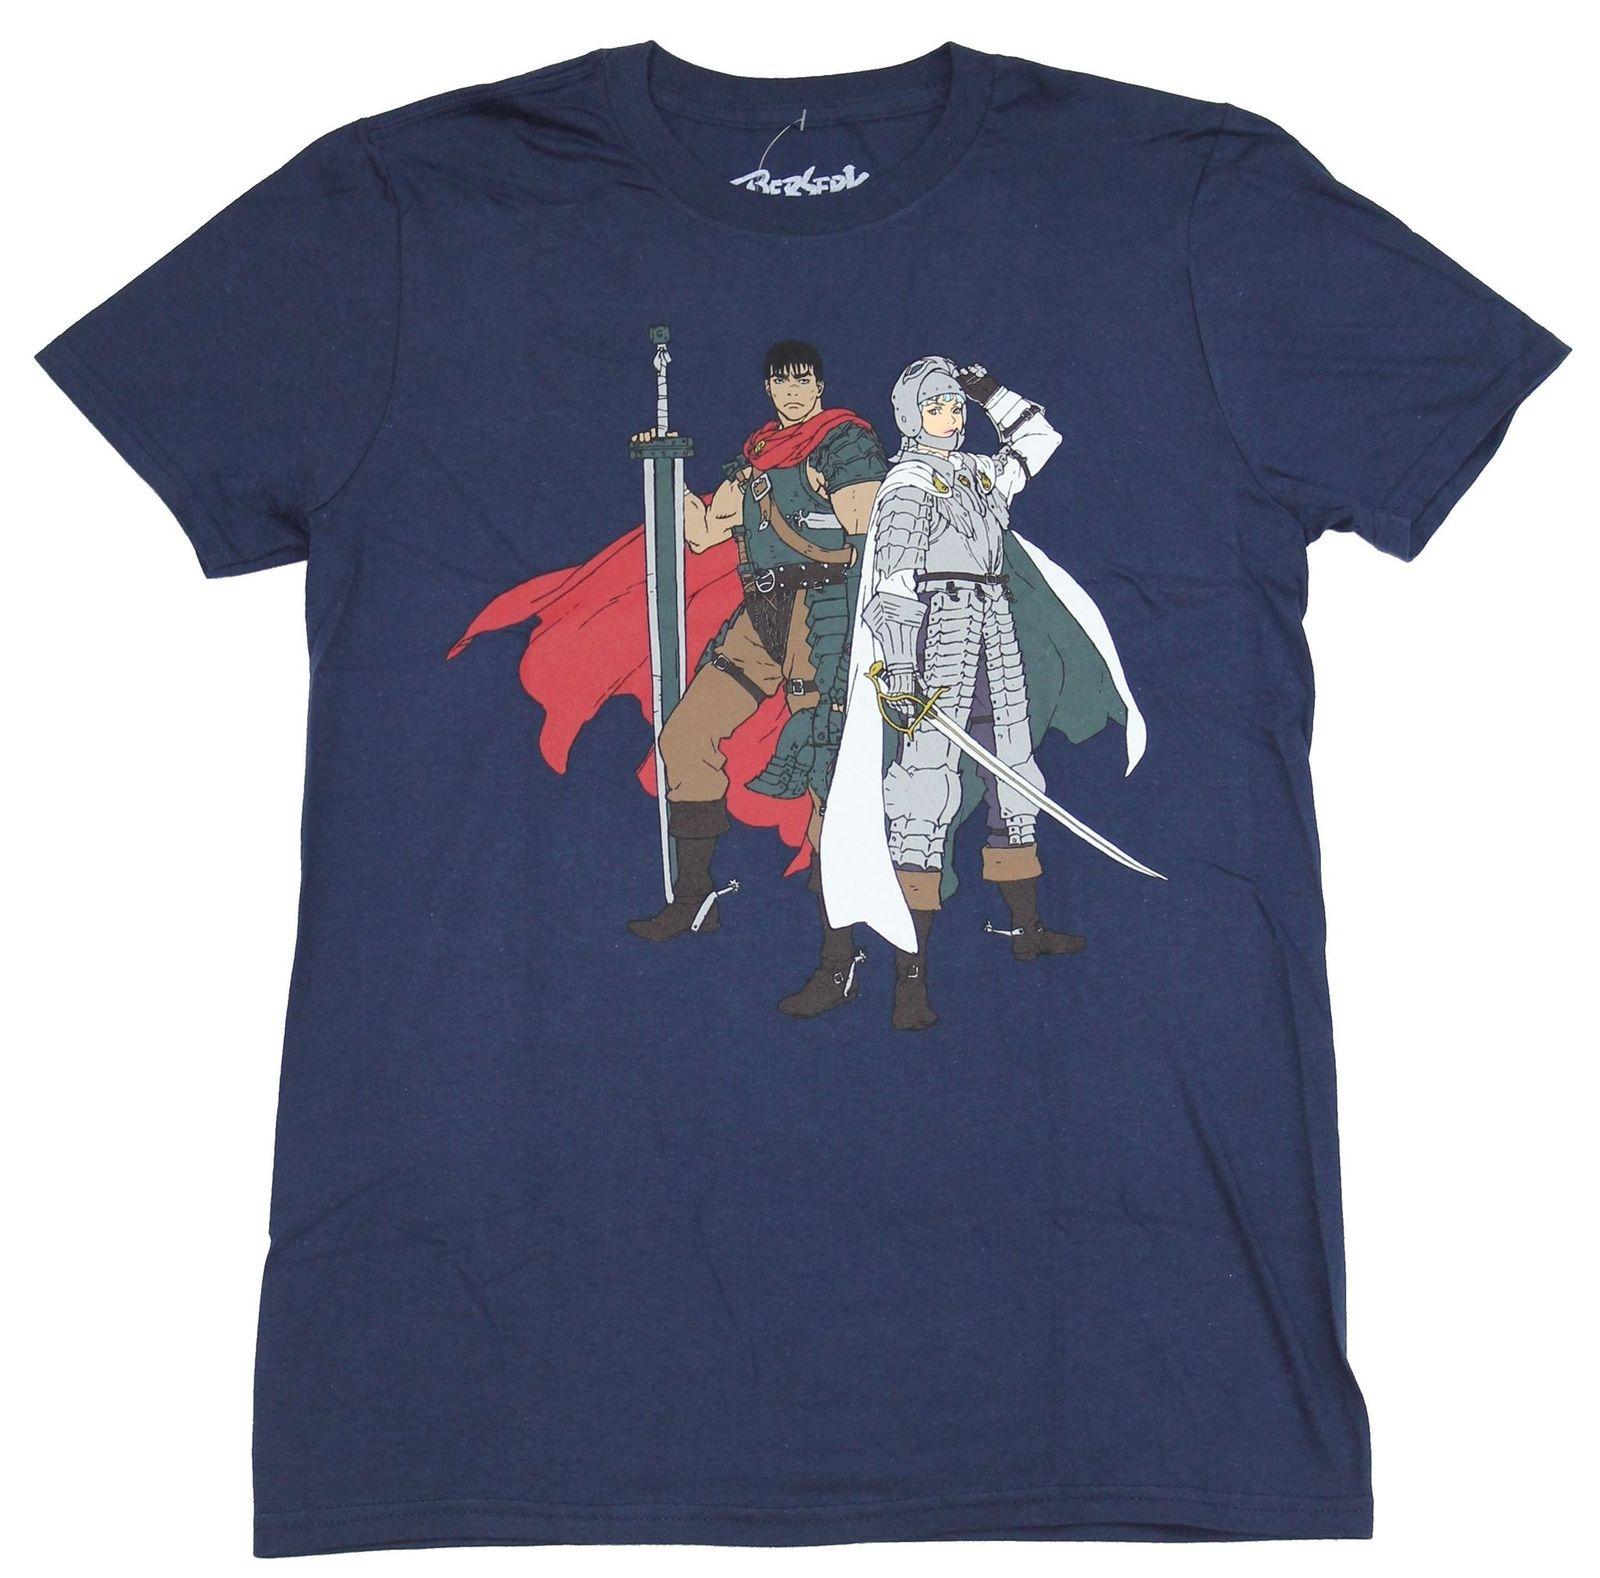 Berserk película para hombre Camiseta-Guts & Griffith Standing Battle Ready Cartoon camiseta hombres Unisex nueva camiseta de moda envío gratis